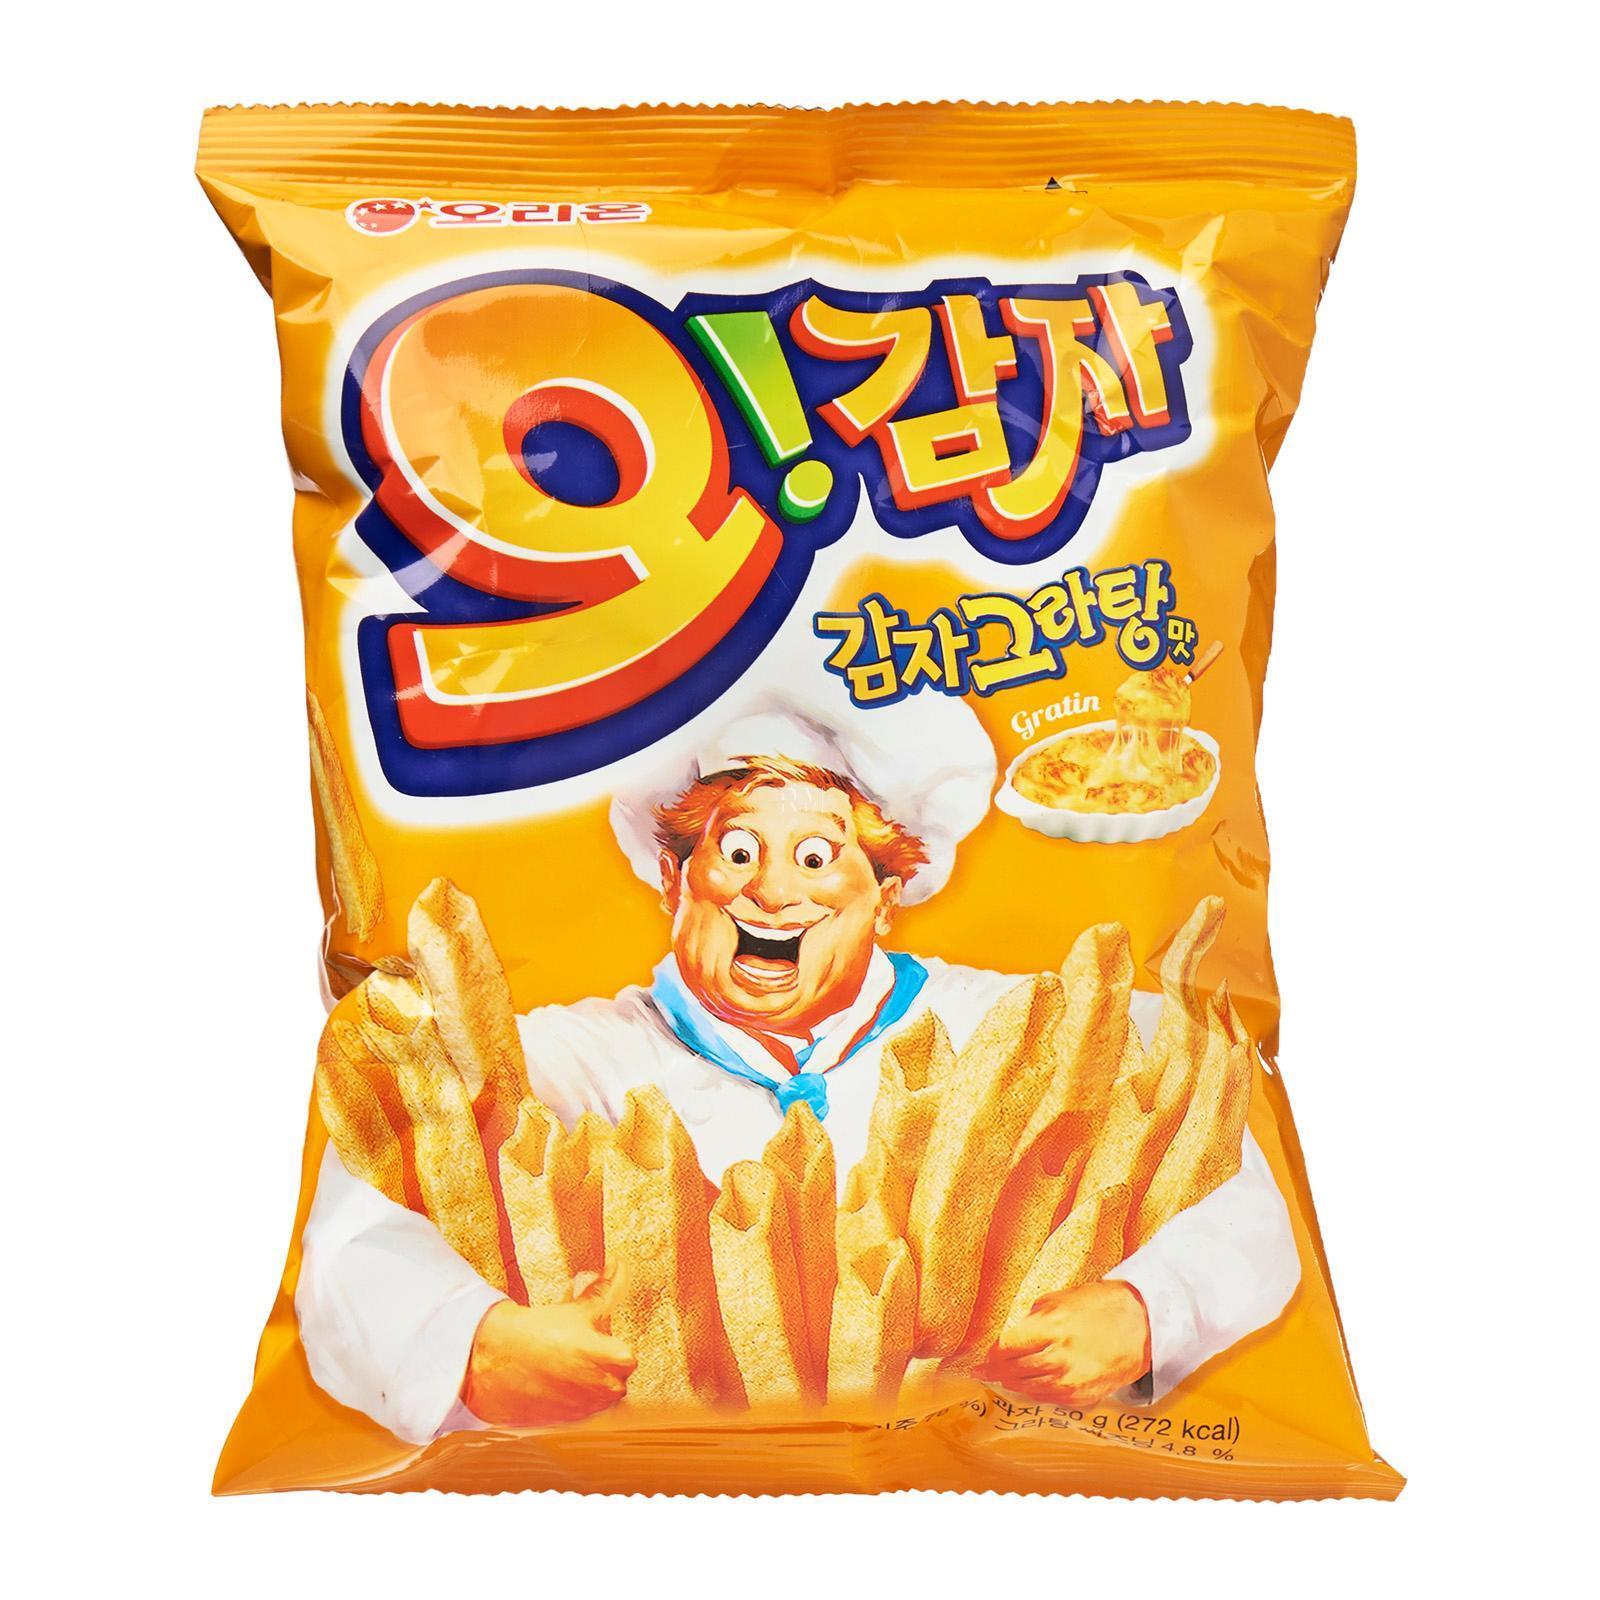 Orion Korean Oh Gamja Original Snacks